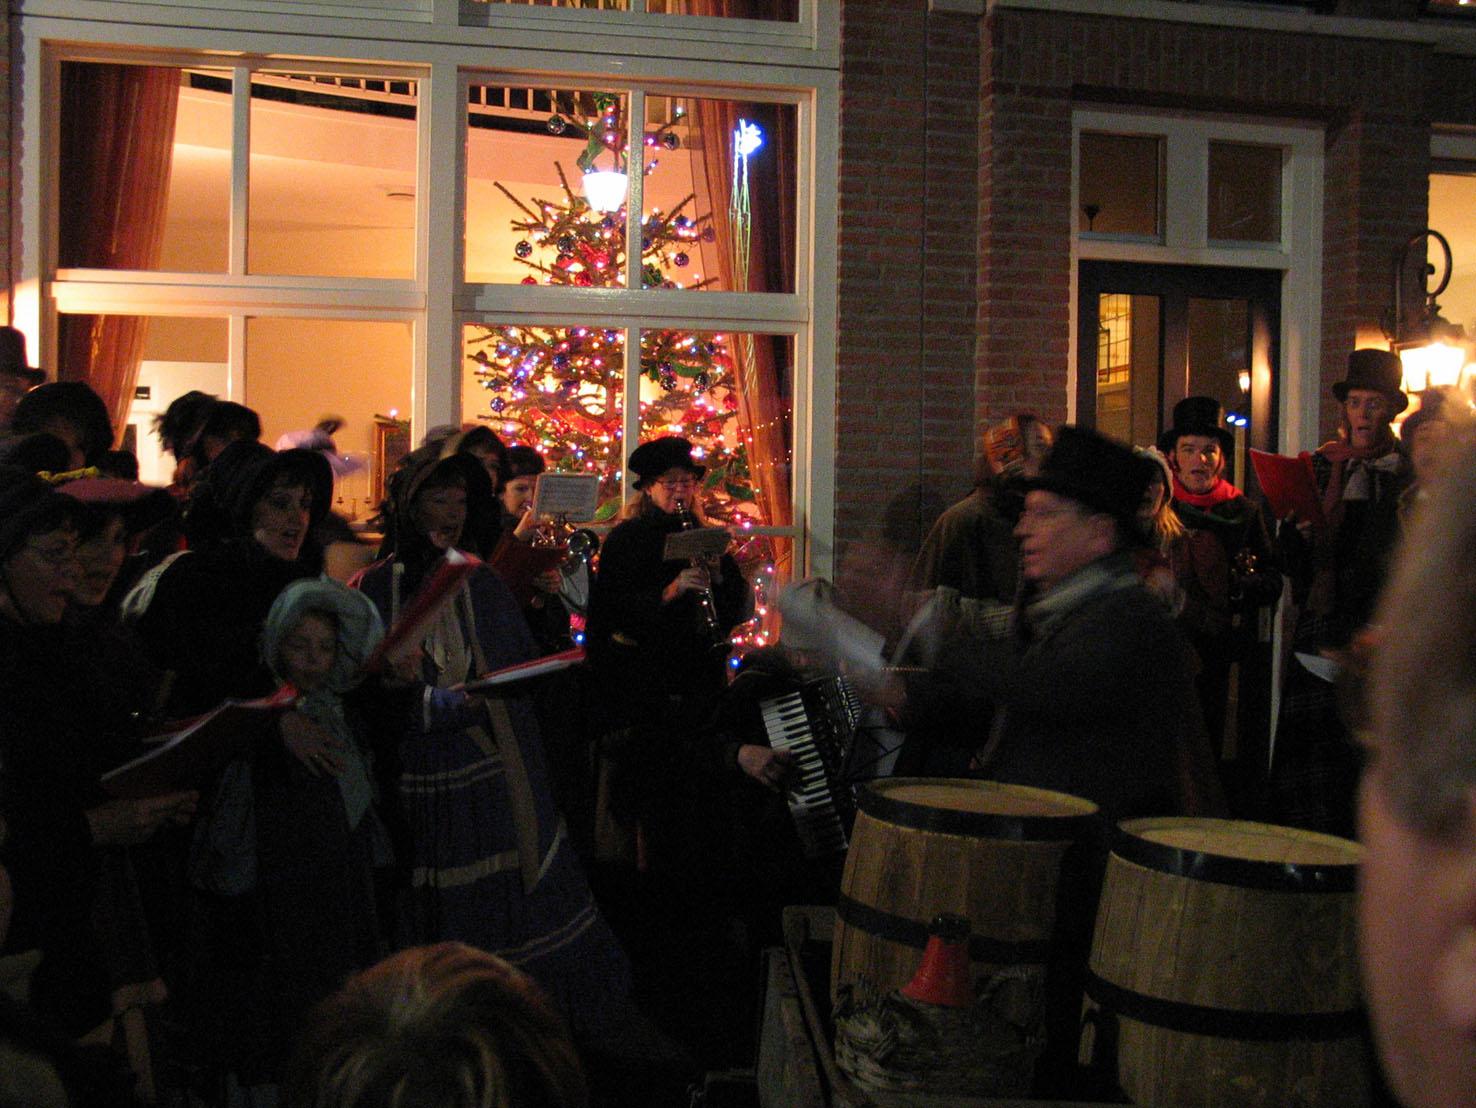 089 - Kerstmarkt Helmond 2003.jpg